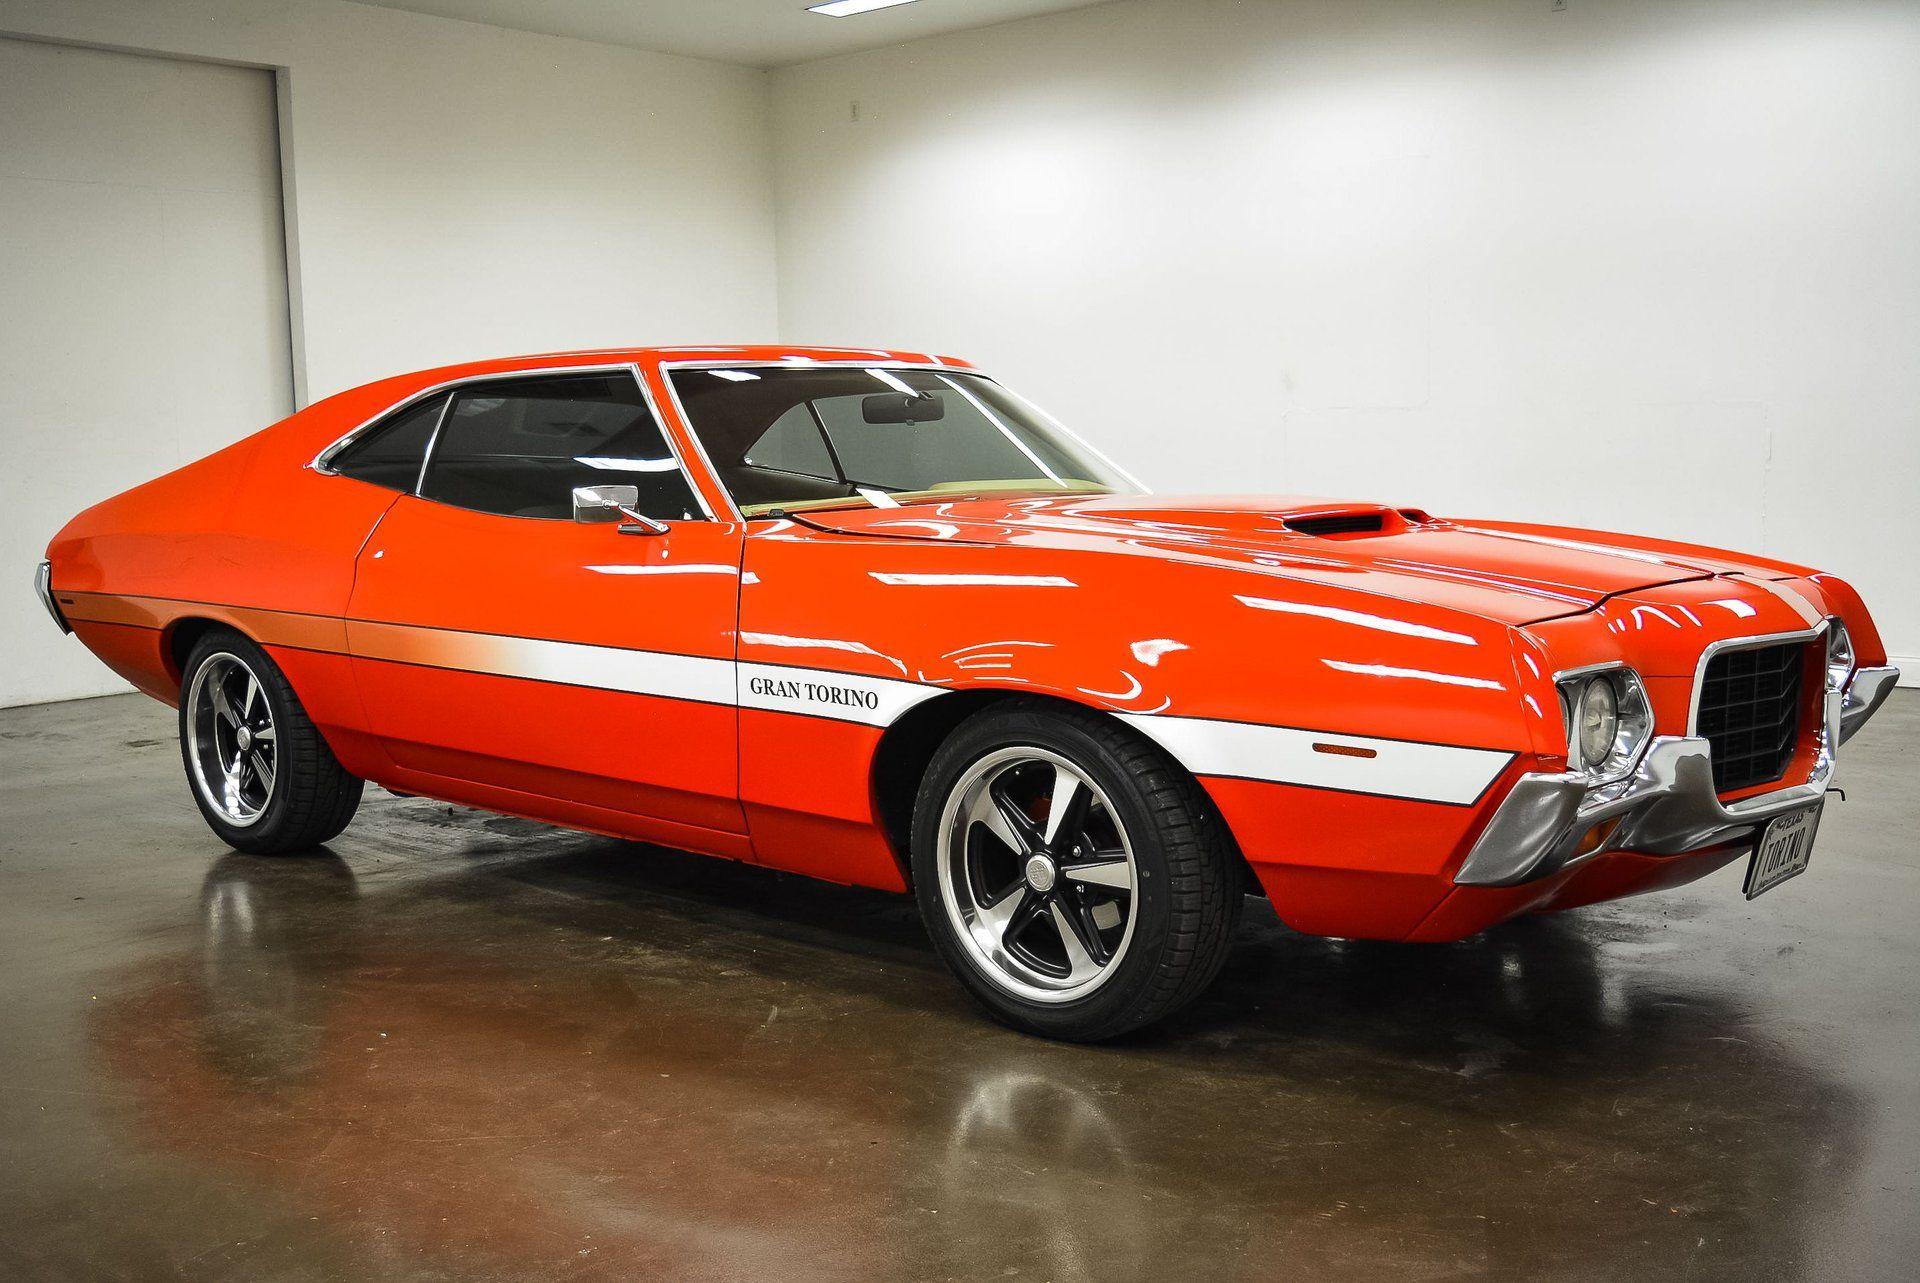 "<img src=""1972-ford-gran-torino.jpeg"" alt=""A 1972 Ford Gran Torino"">"